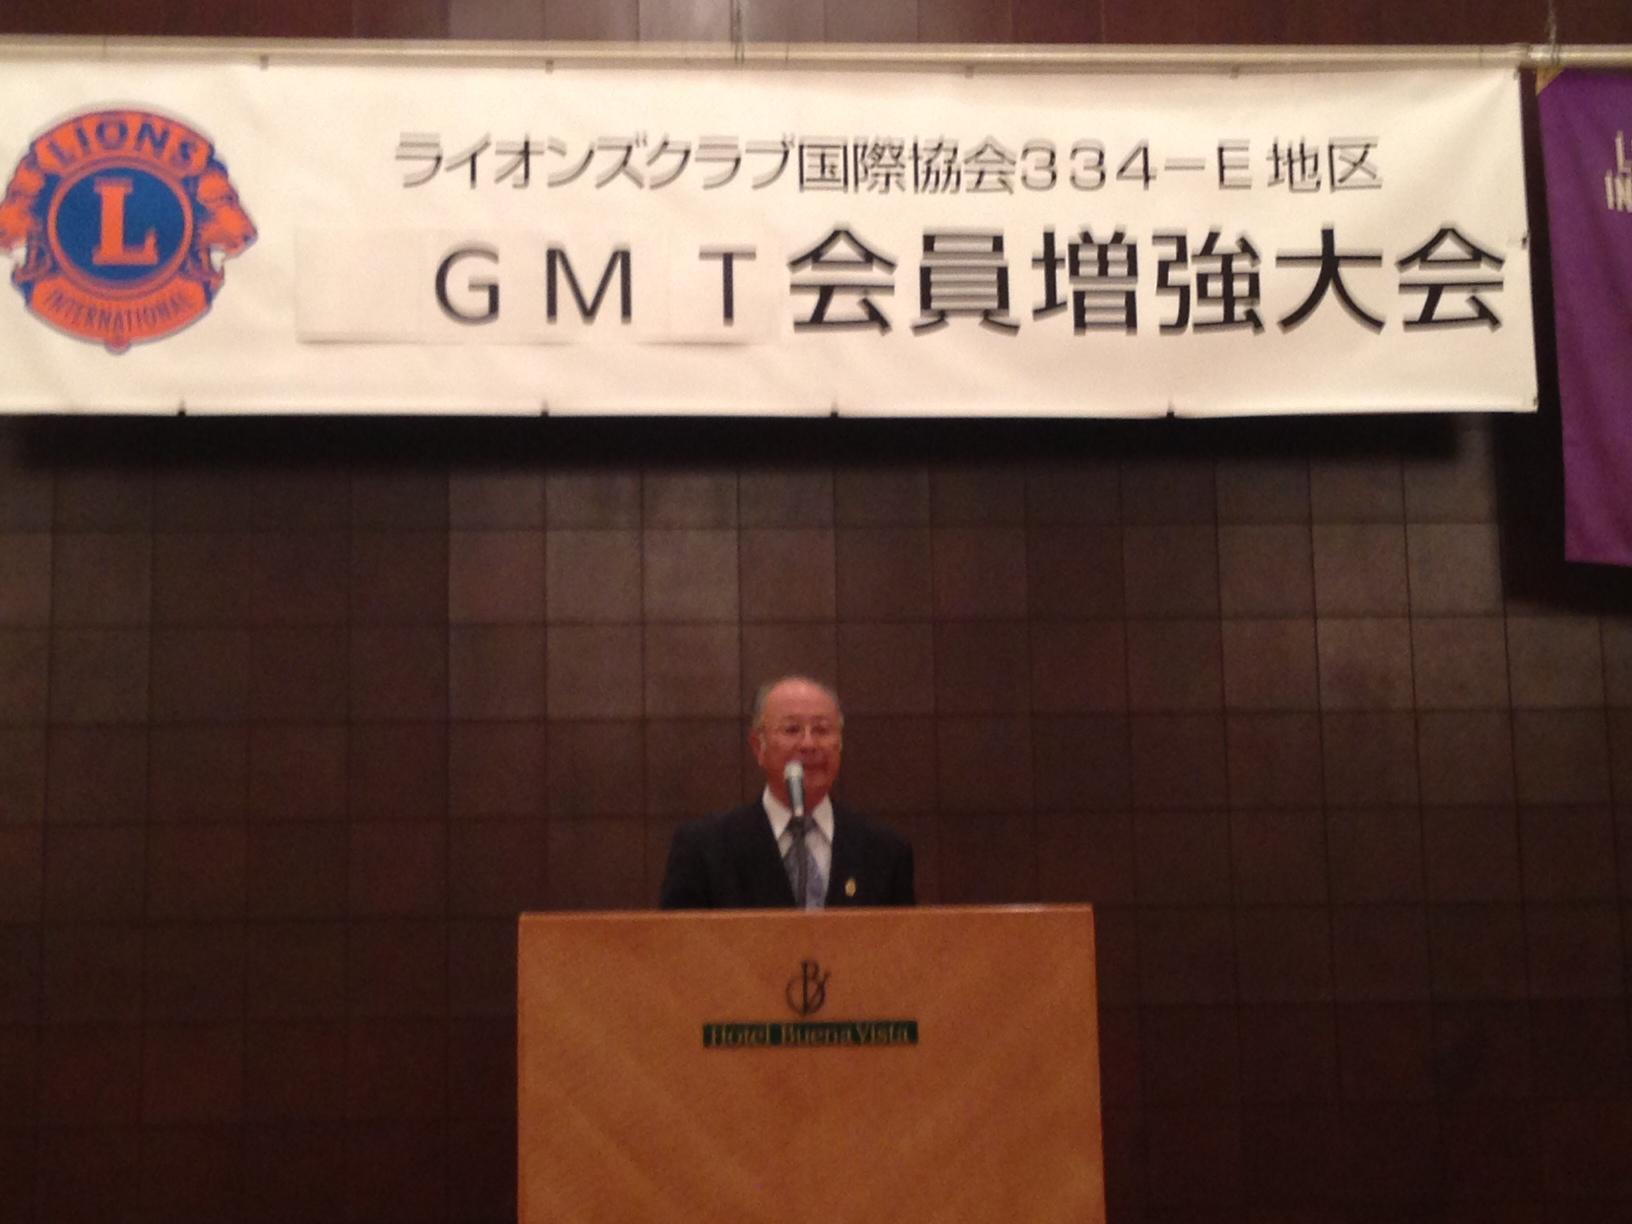 GMT会員増強大会